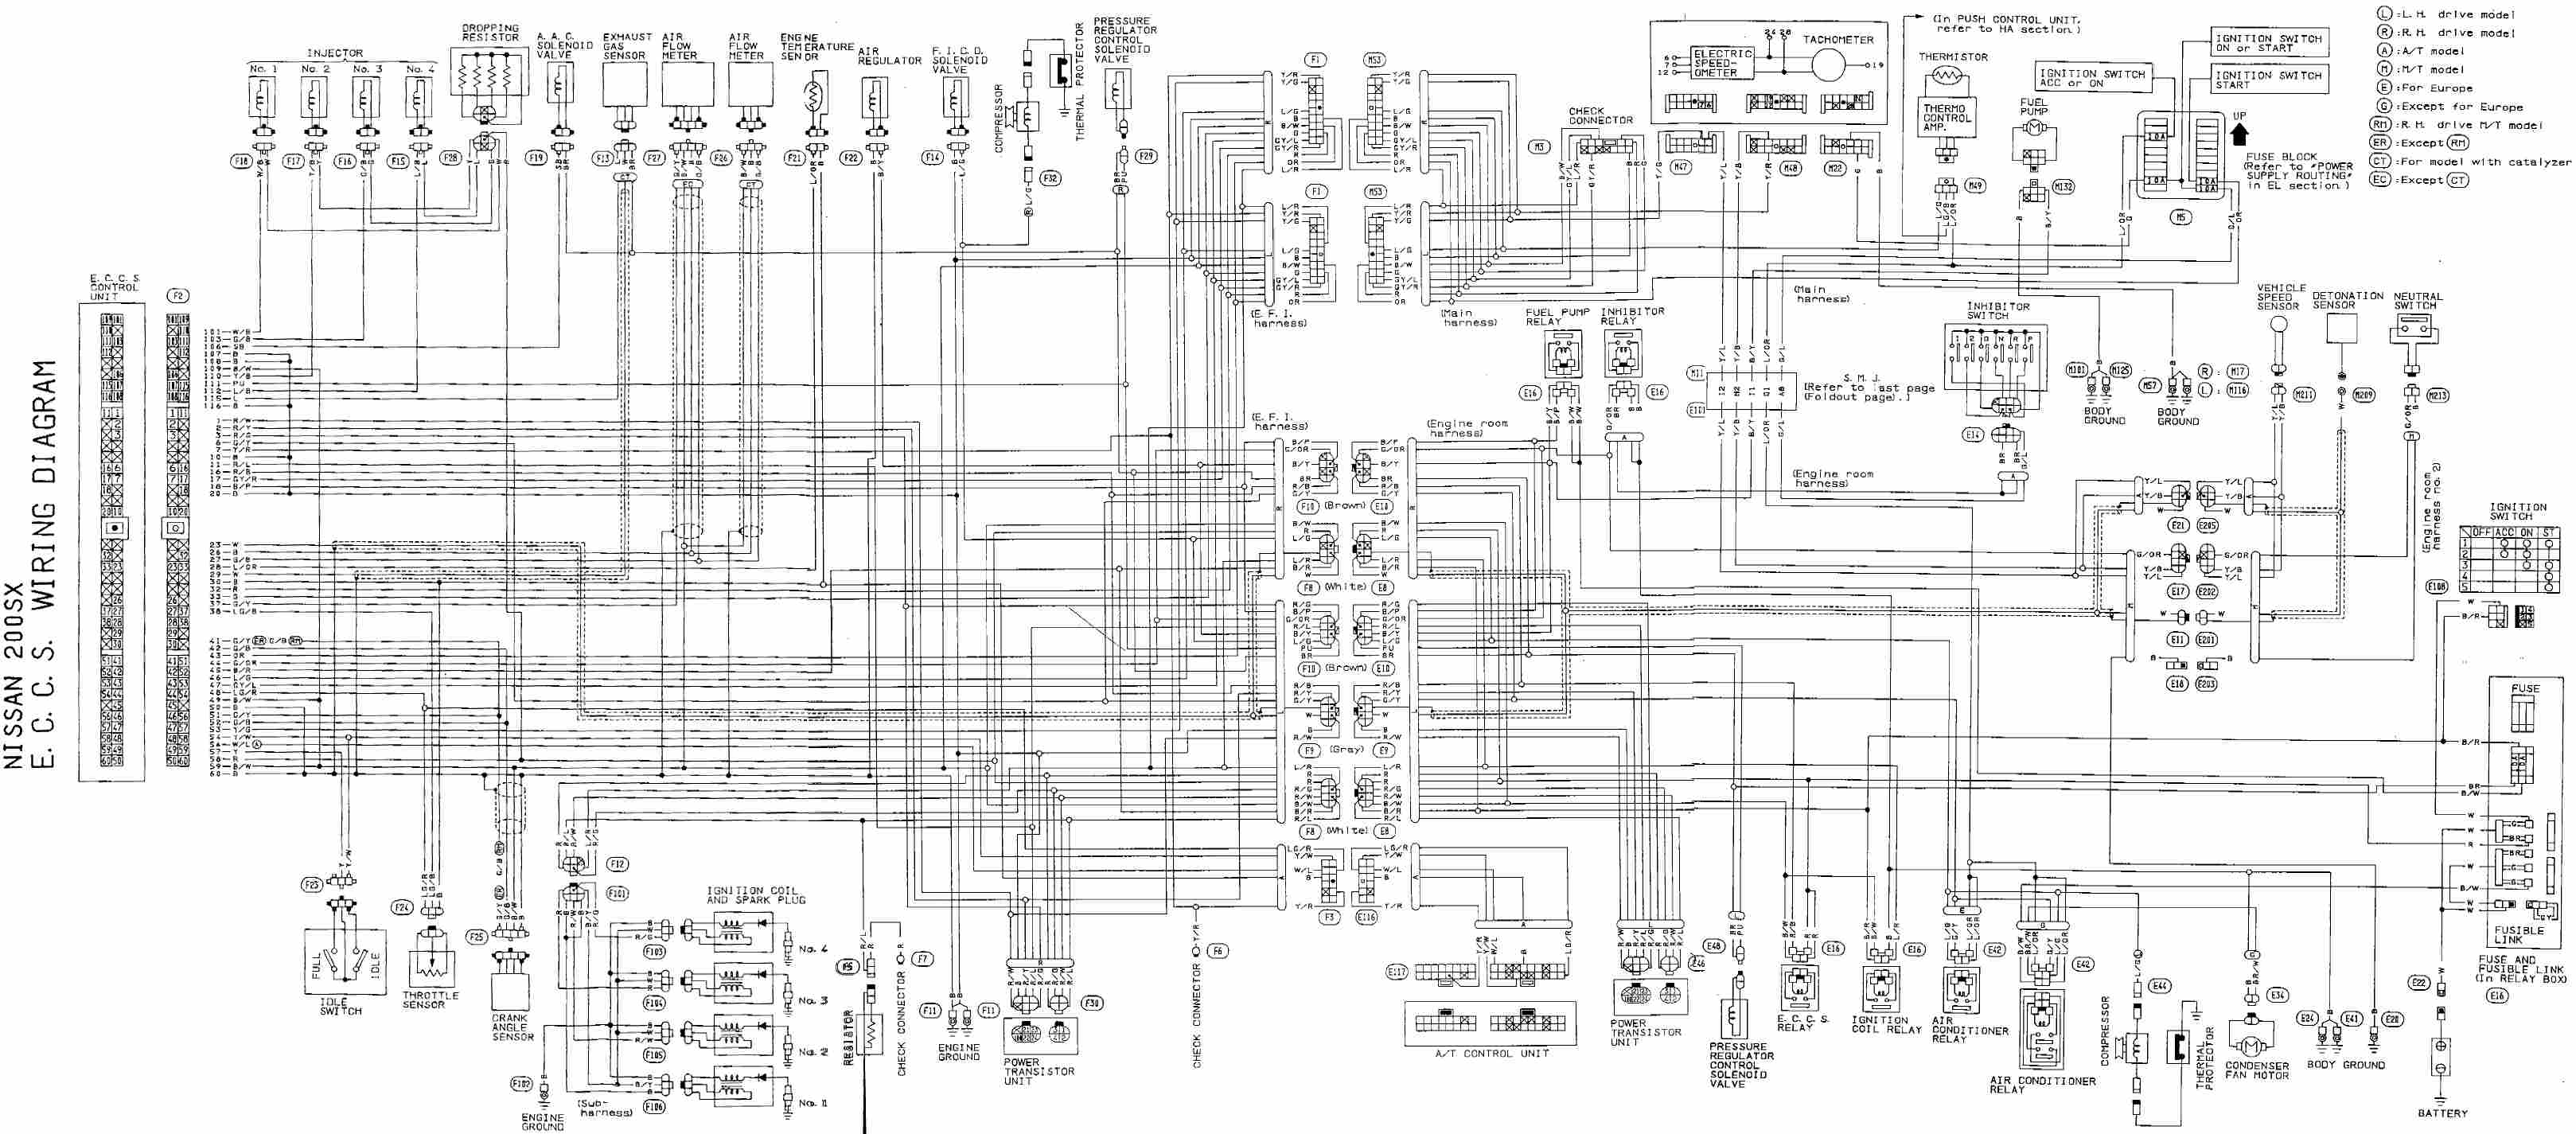 nissan eccs wiring diagram